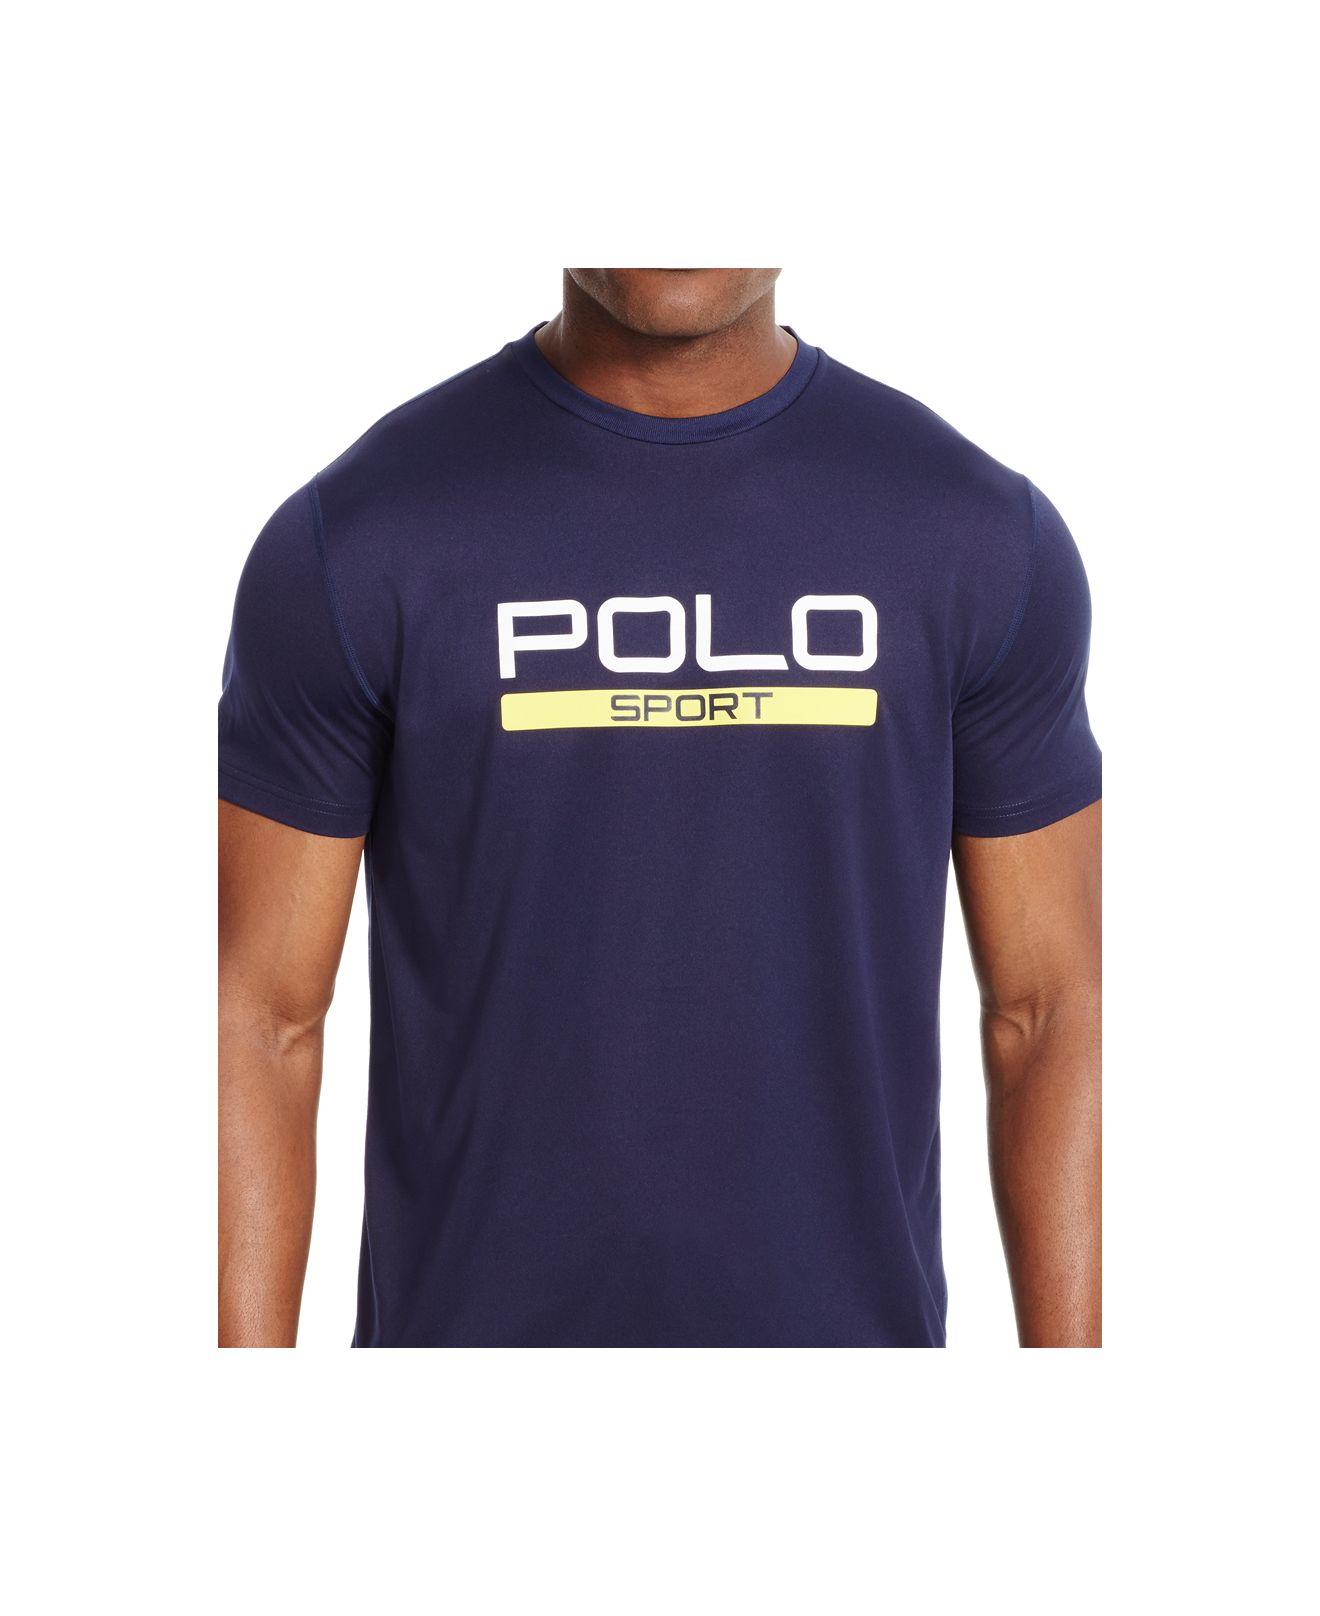 Polo ralph lauren polo sport men 39 s performance jersey t for Ralph lauren polo jersey shirt